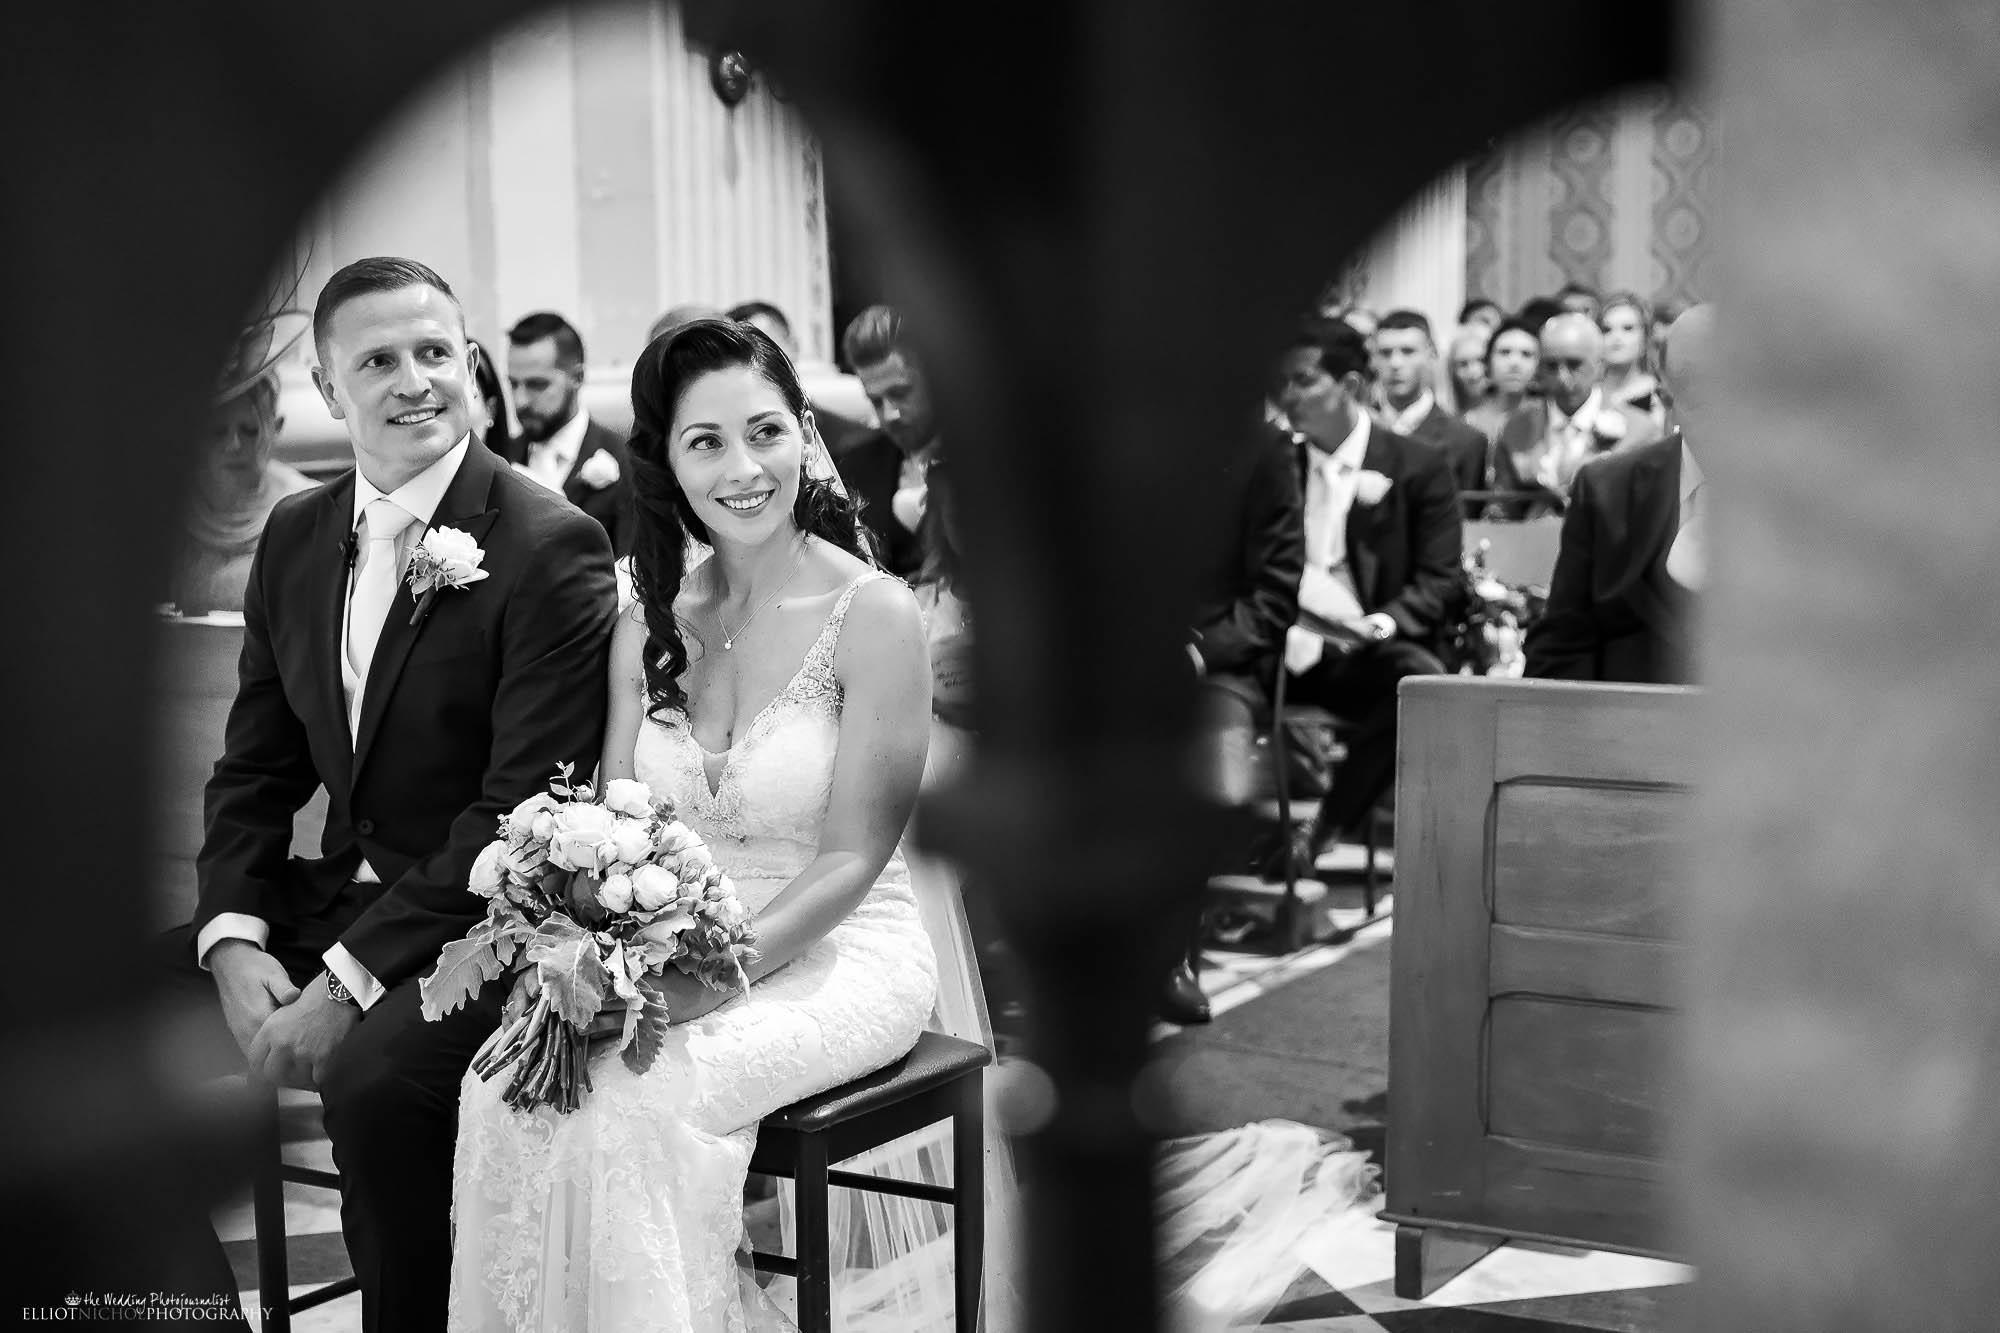 bride-groom-marriage-ceremony-church-wedding-photography-Malta